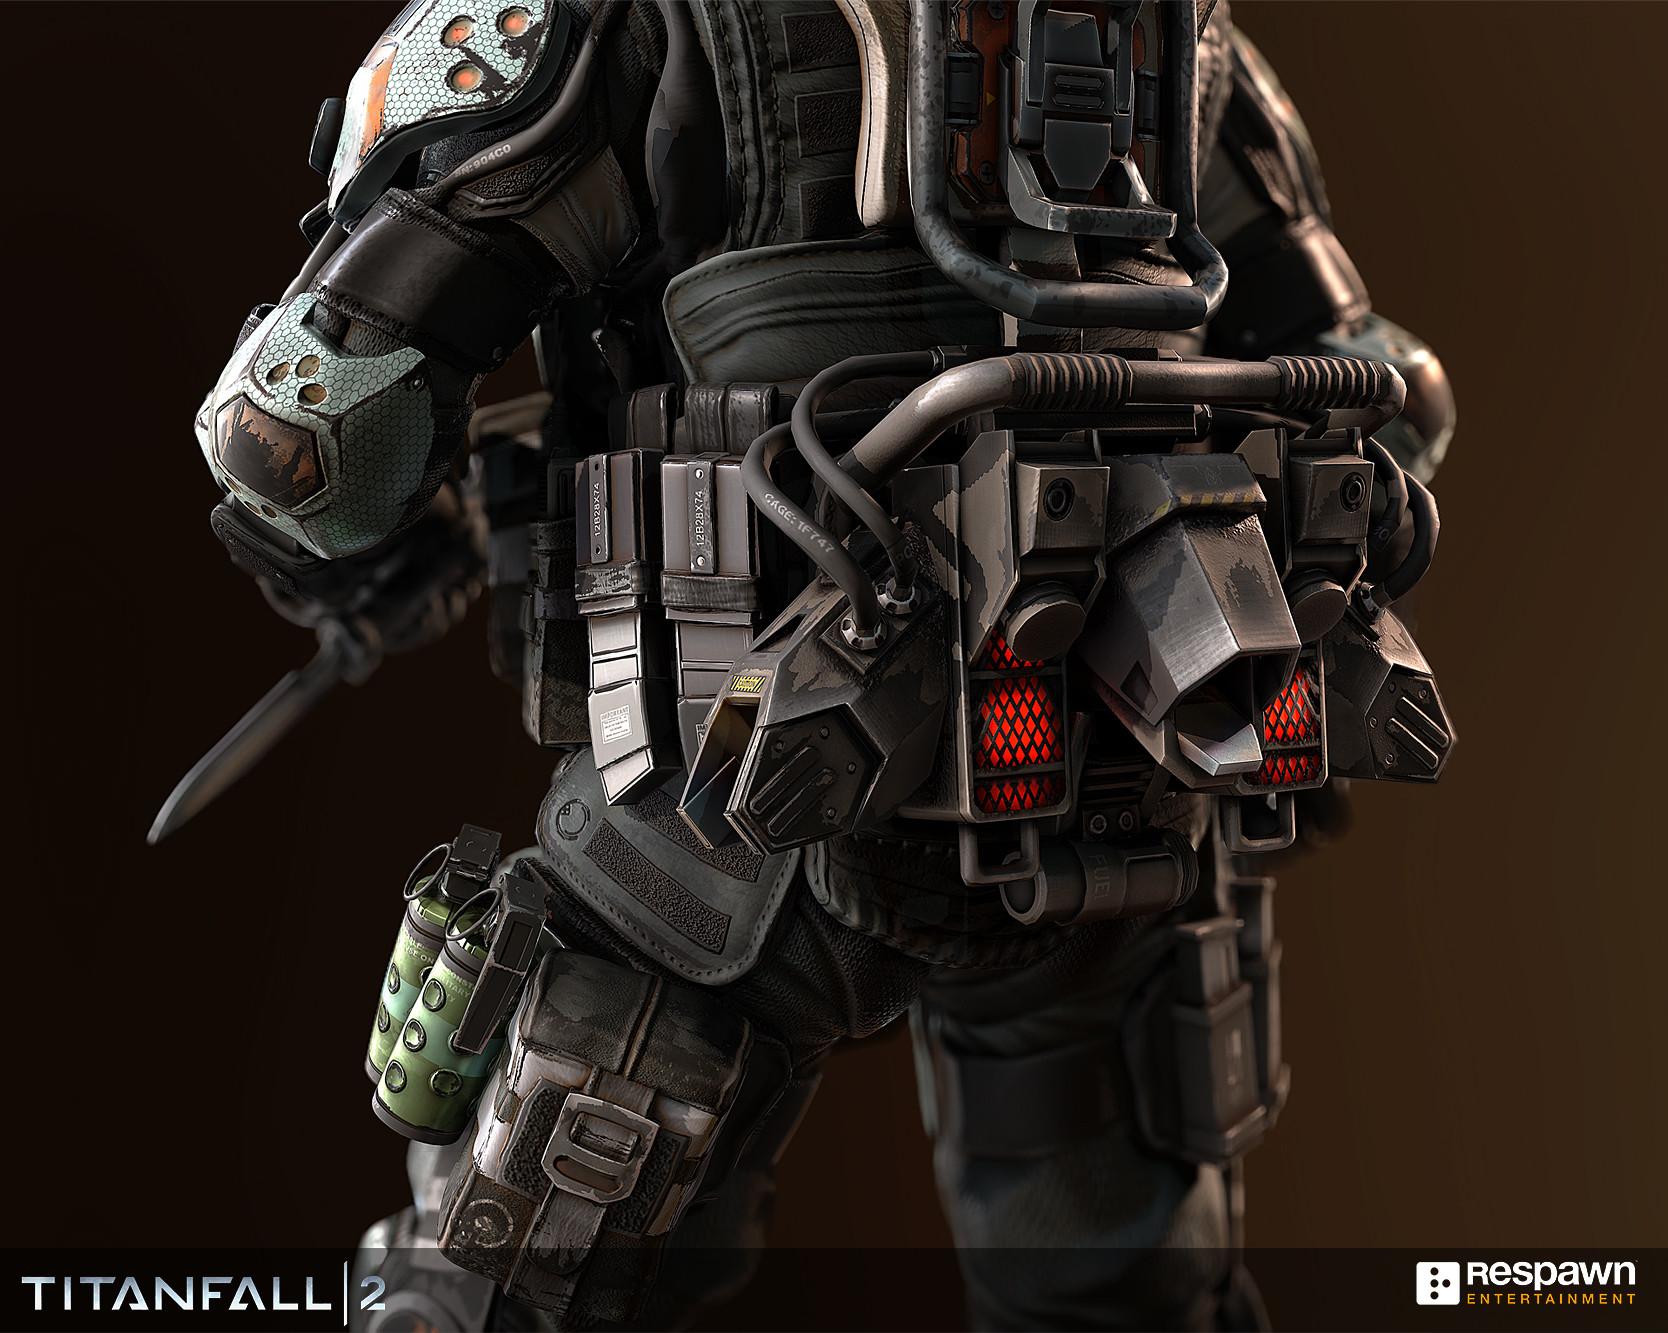 Titanfall Artwork